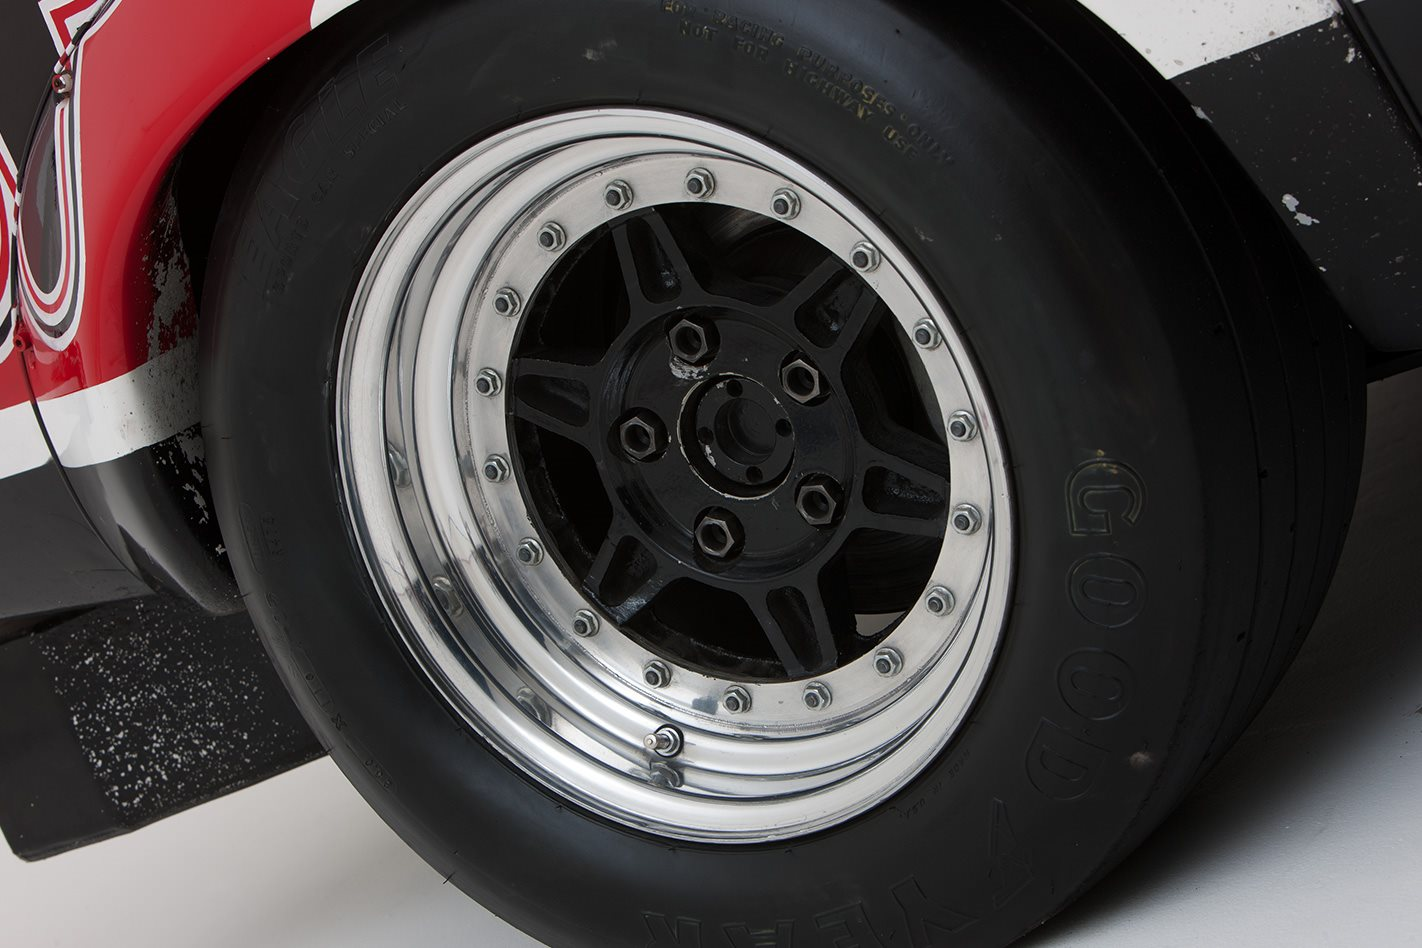 1978 HDT Torana A9X wheel